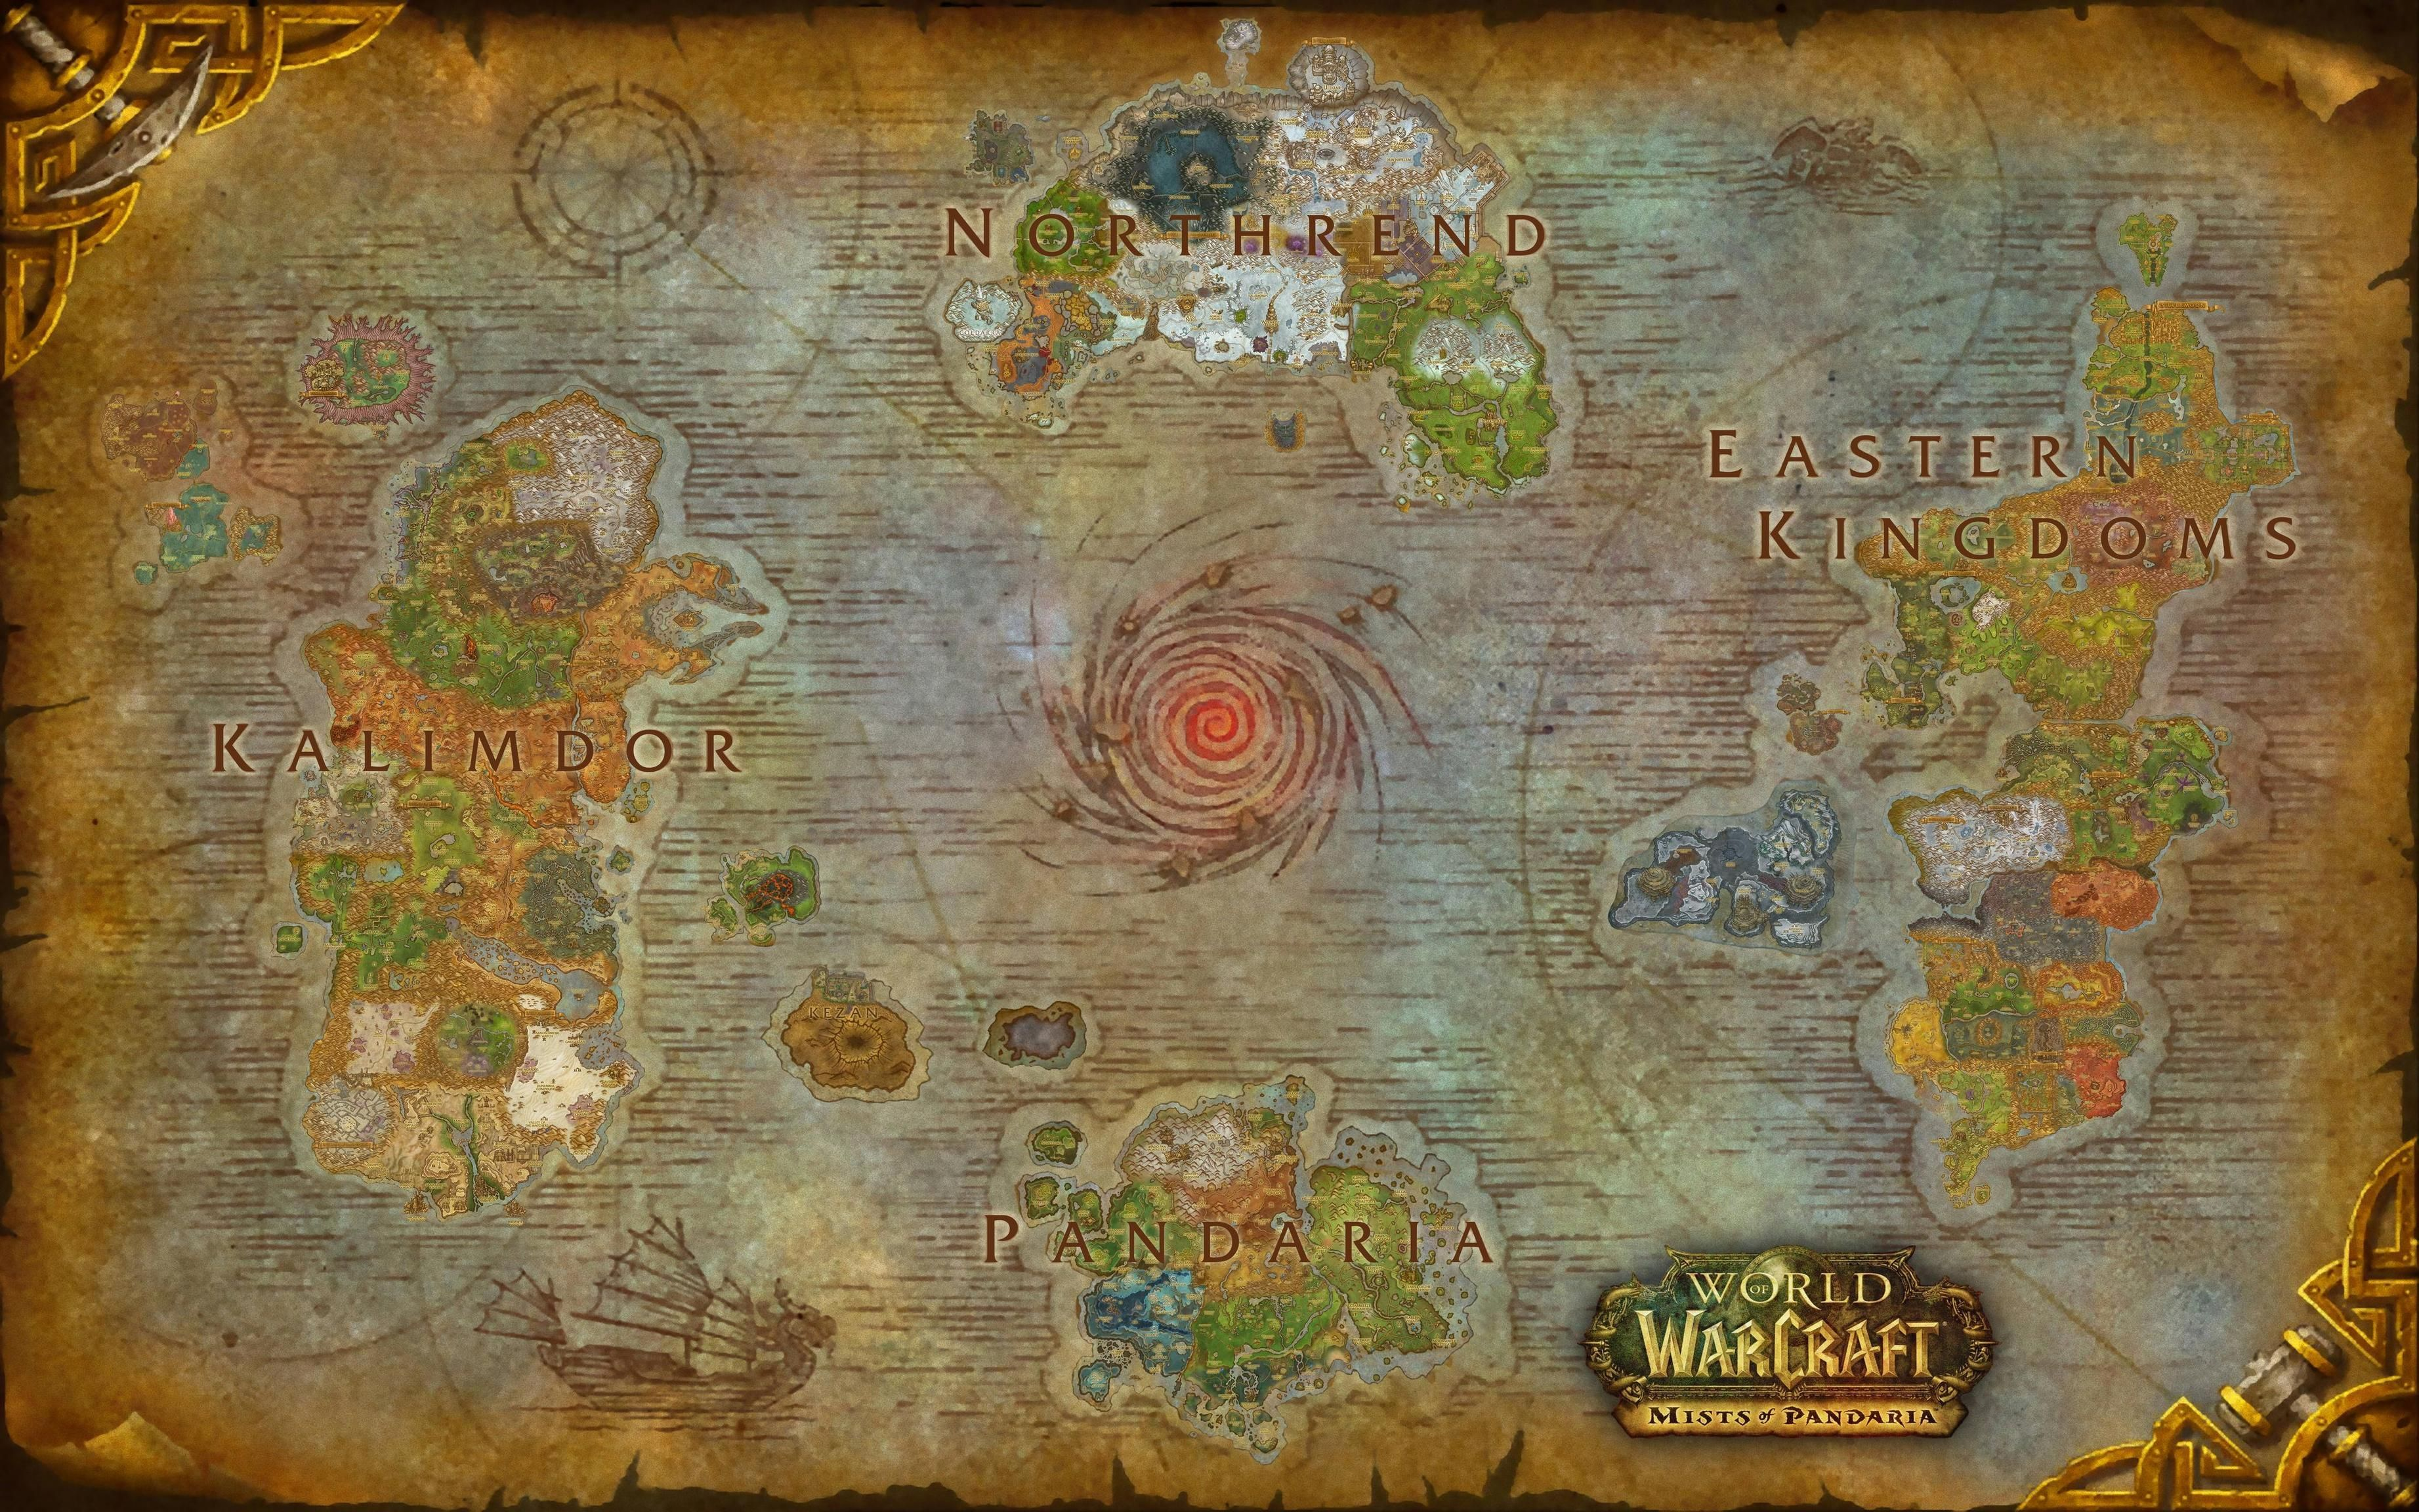 Azeroth Map posite 300 DPI Wow Throughout World Warcraft Art